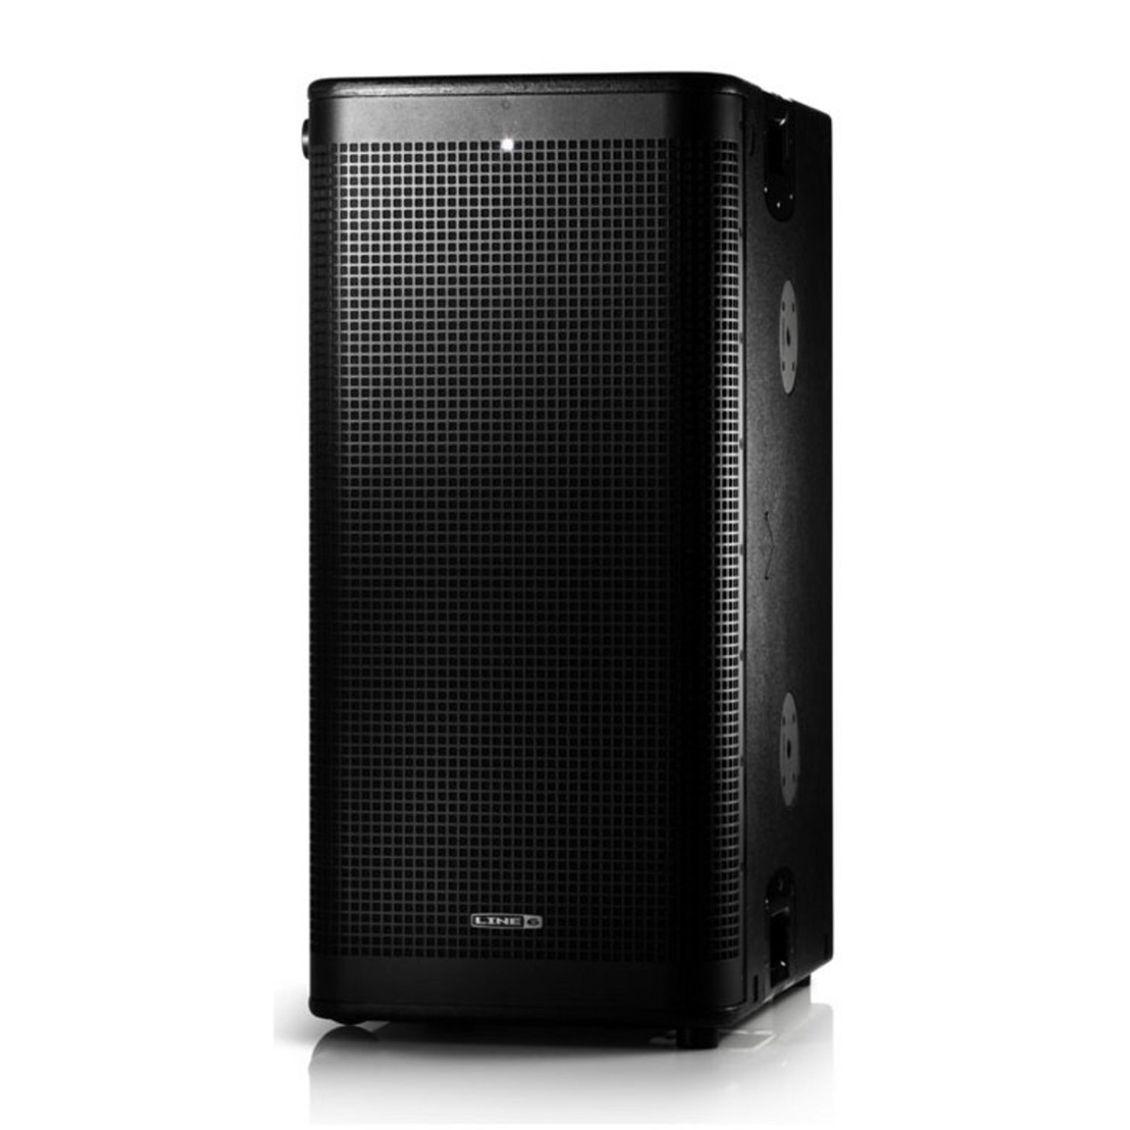 Line 6 Speakers : line 6 pa speakers and monitors rich tone music ~ Russianpoet.info Haus und Dekorationen